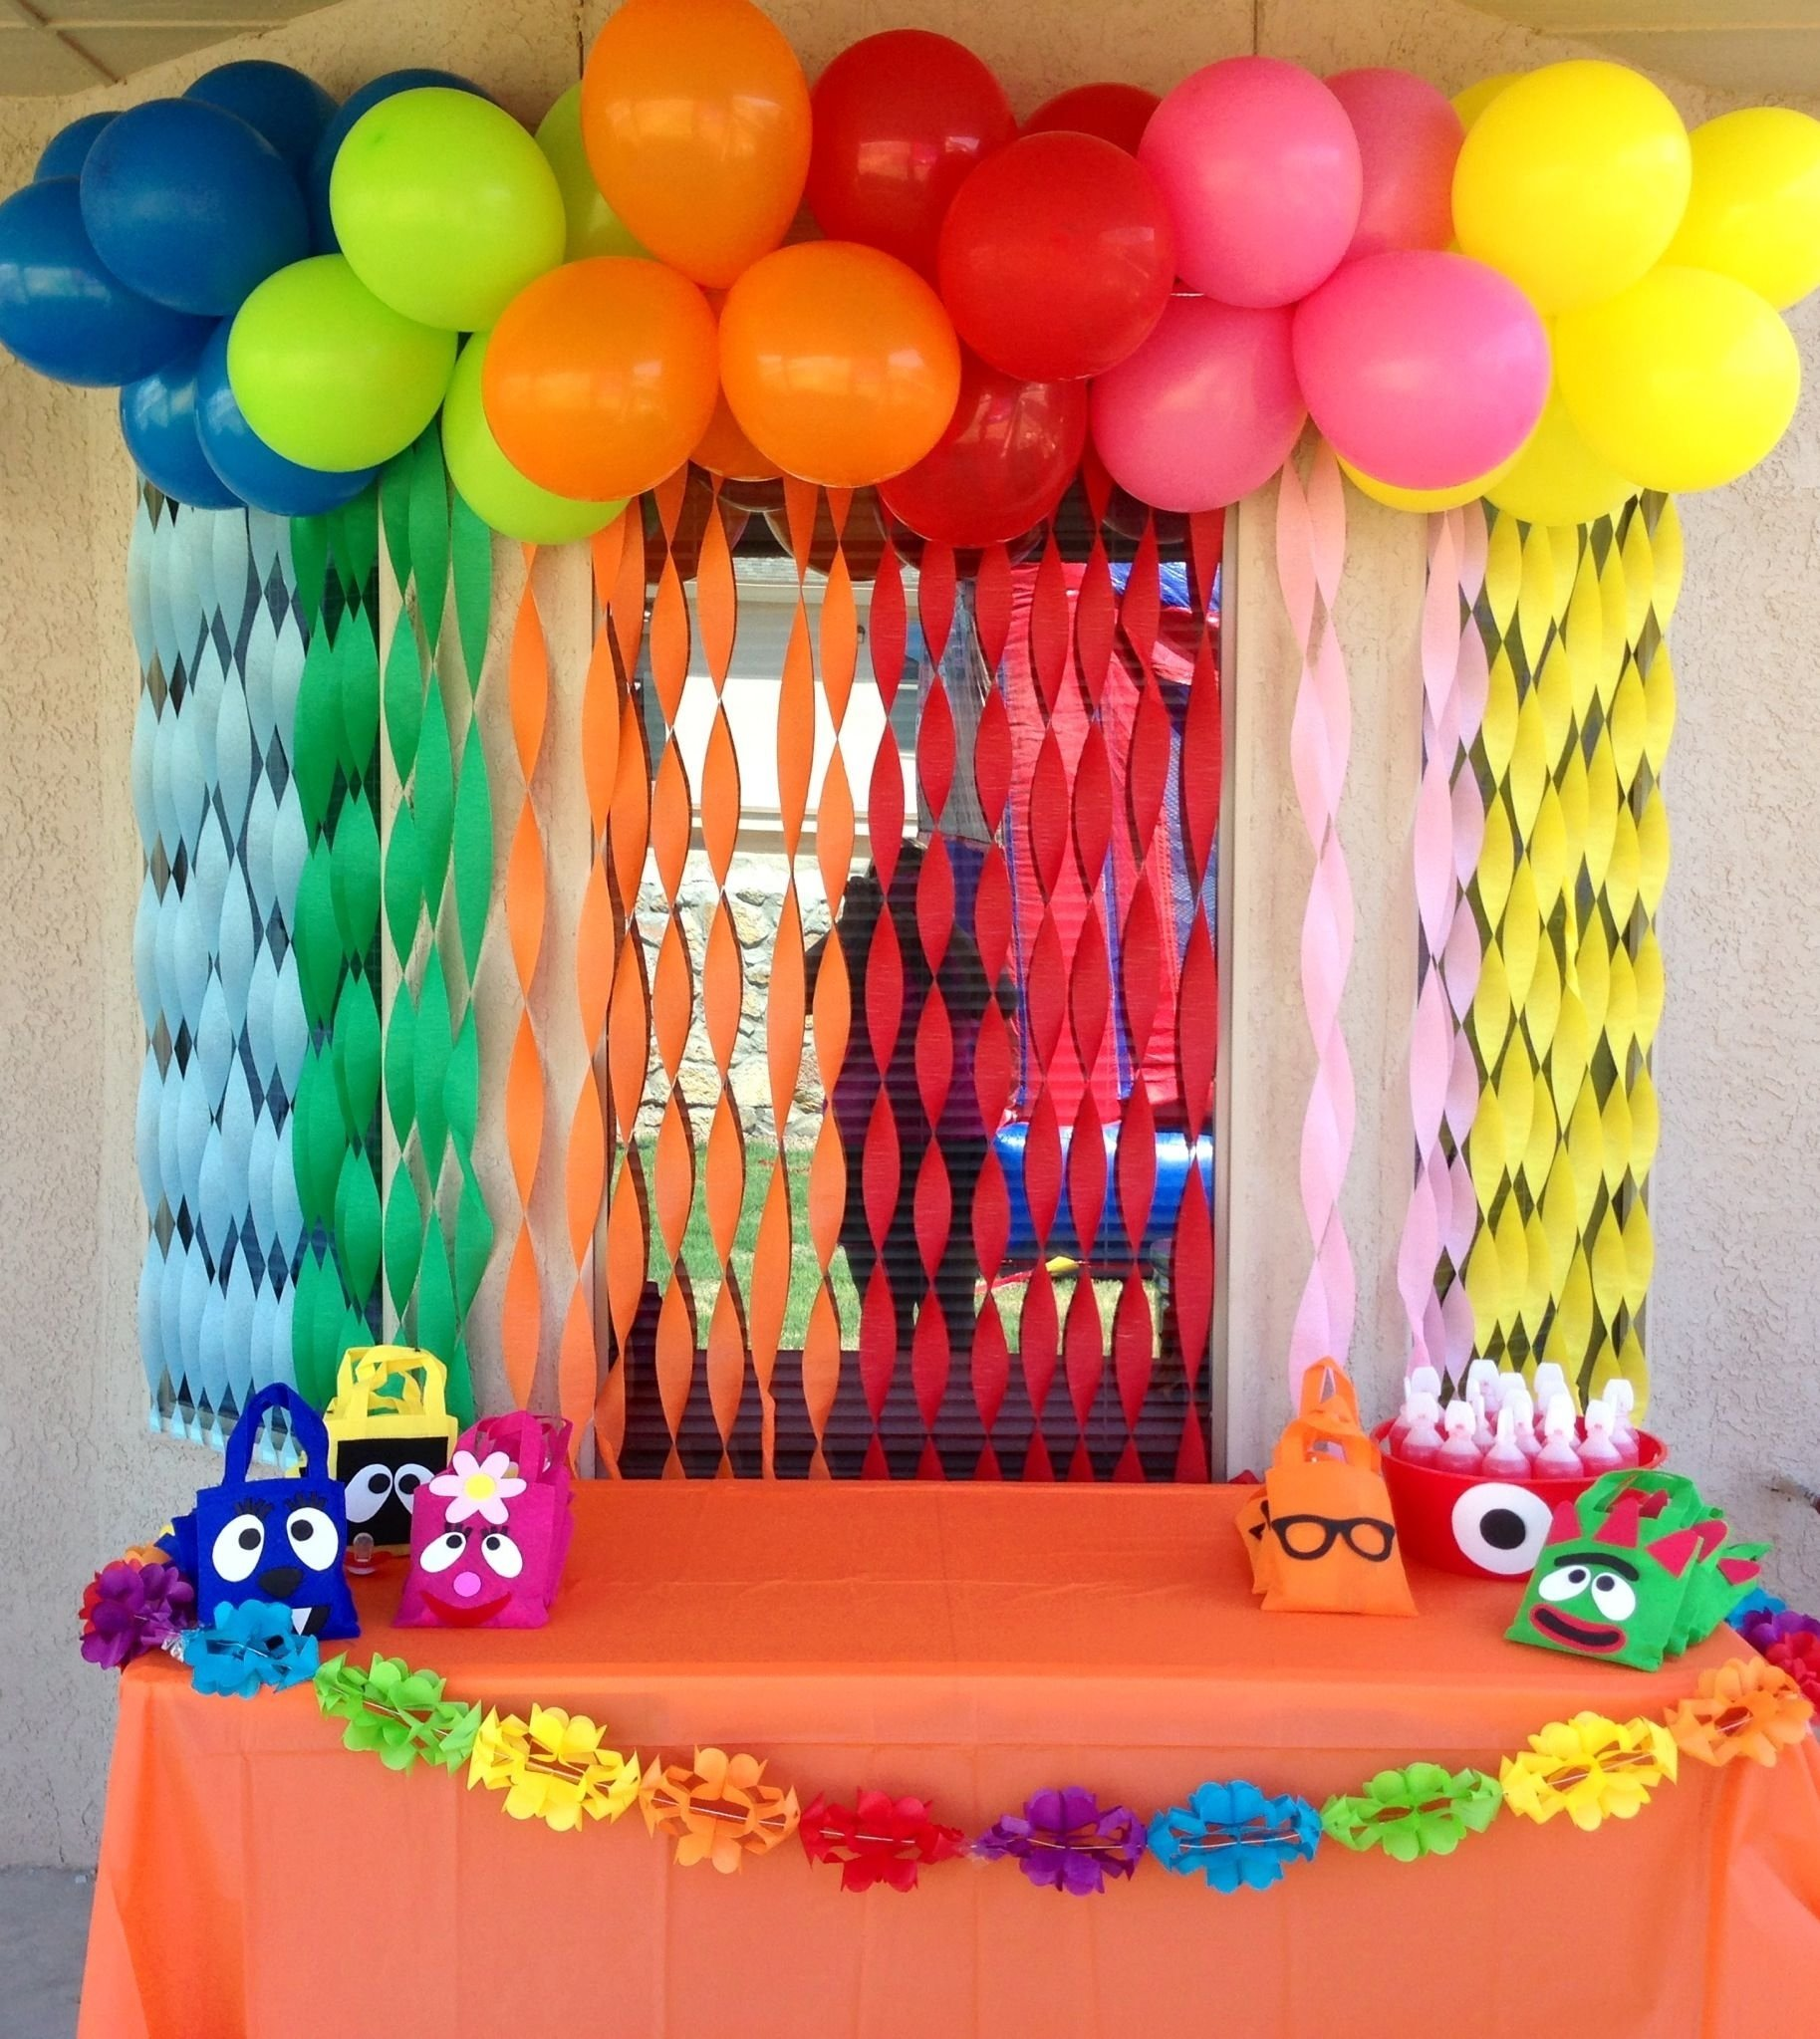 10 Attractive Yo Gabba Gabba Birthday Ideas yo gabba gabba birthday party birthdays pinterest yo gabba 2